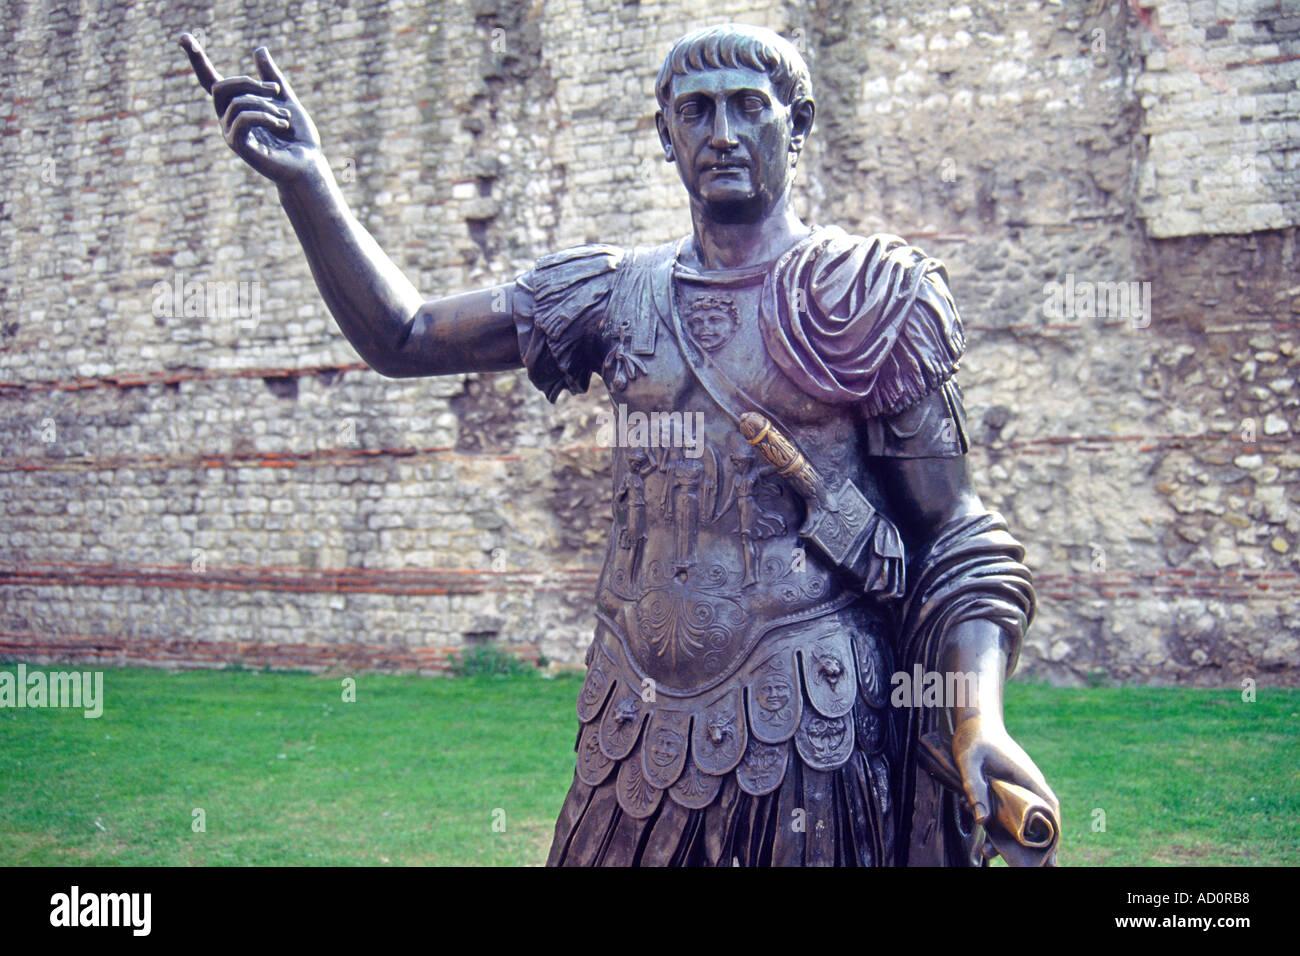 Statue of the Roman emperor Trajan in London. - Stock Image